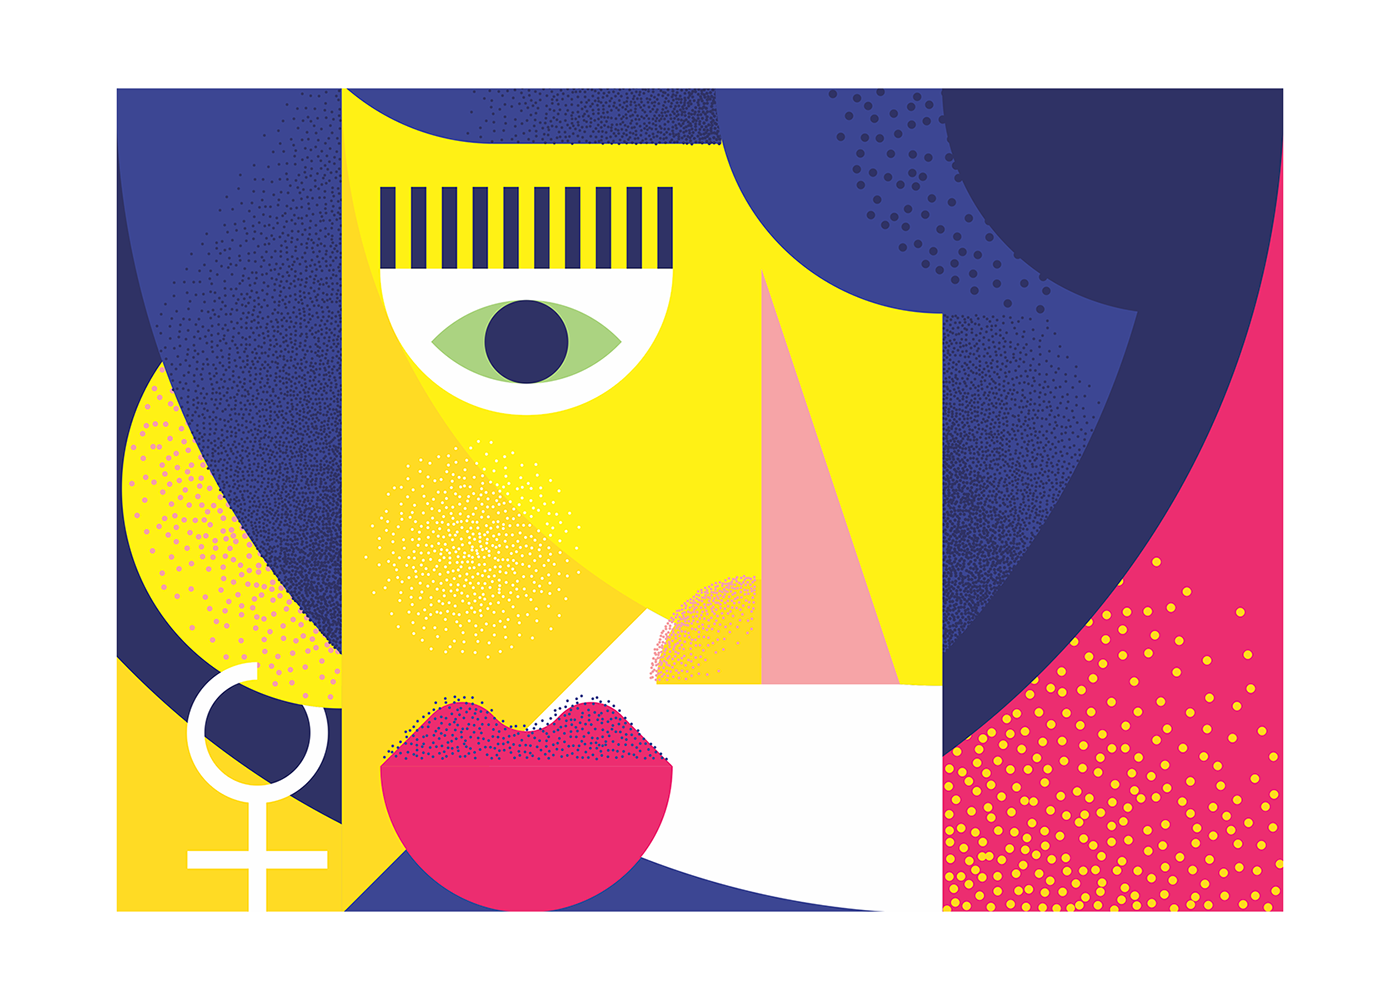 calendar 2018 calendar 2018 tech logos design thinking. Black Bedroom Furniture Sets. Home Design Ideas